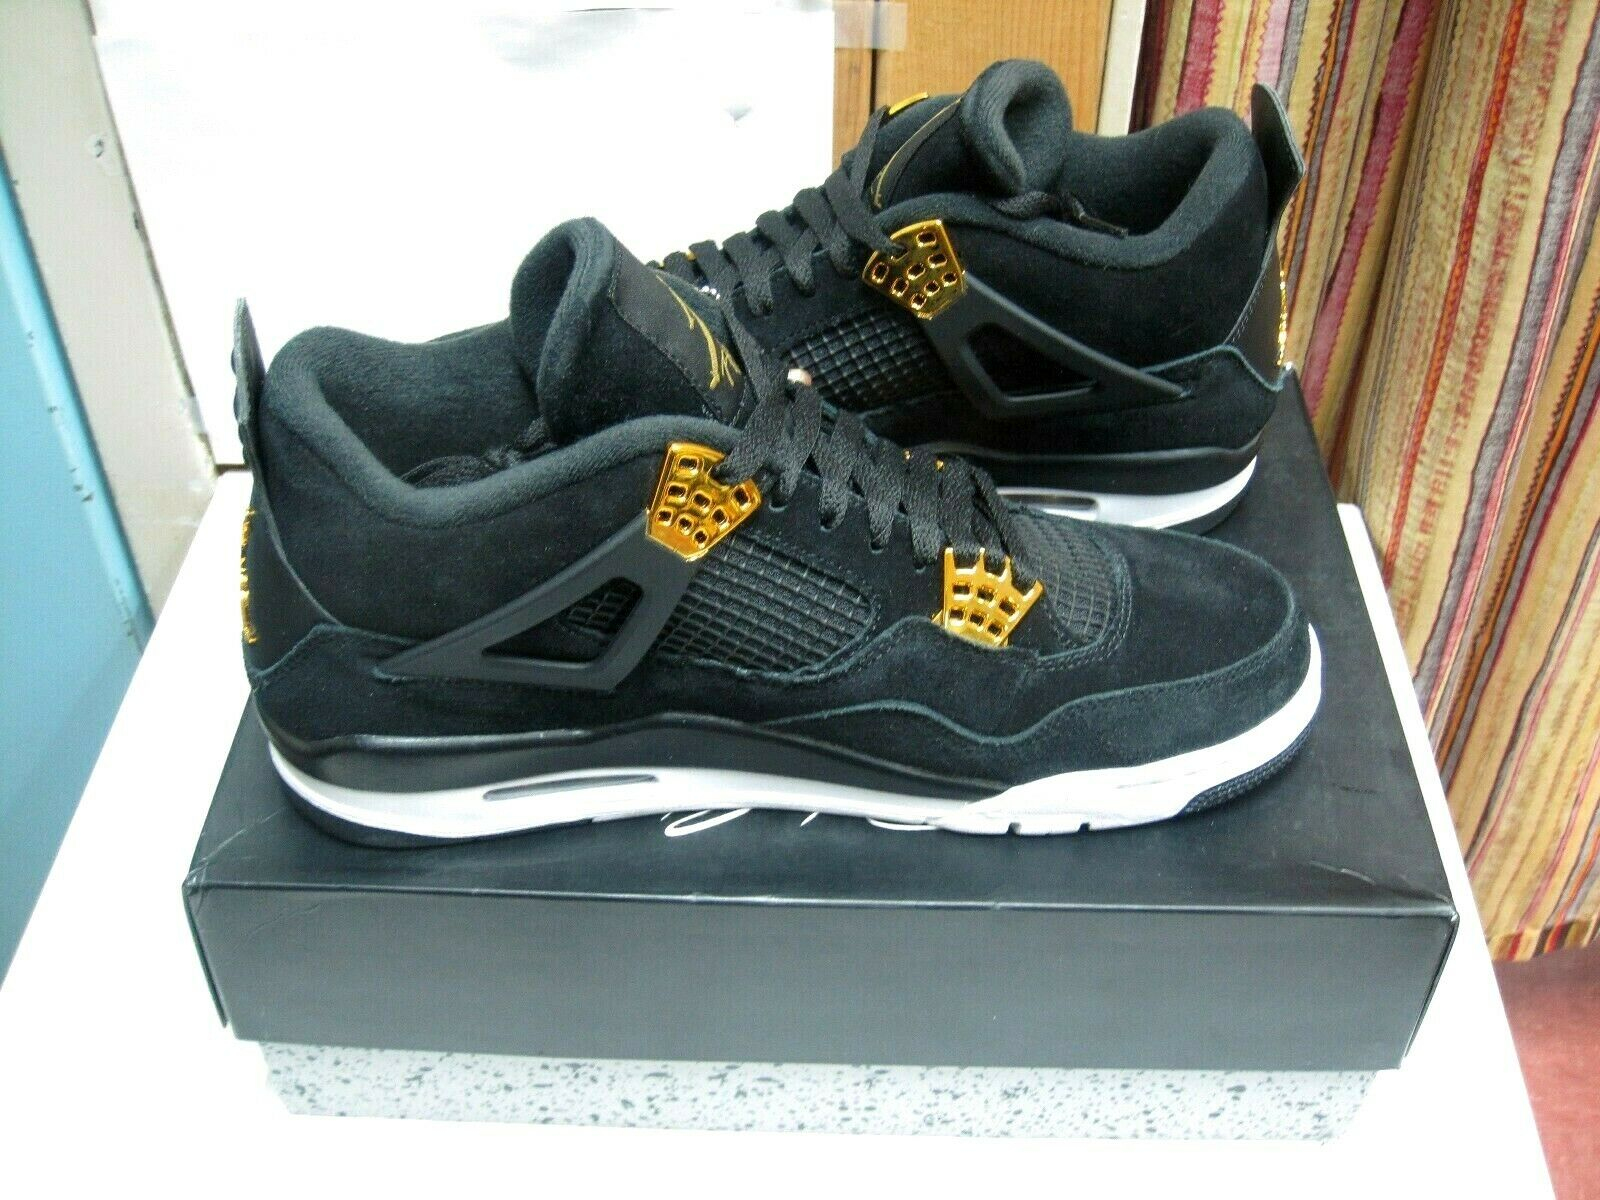 low priced 80cae 17d28 NEW Nike Jordan IV Retro 4 Royalty Men 11 Black gold New in ...